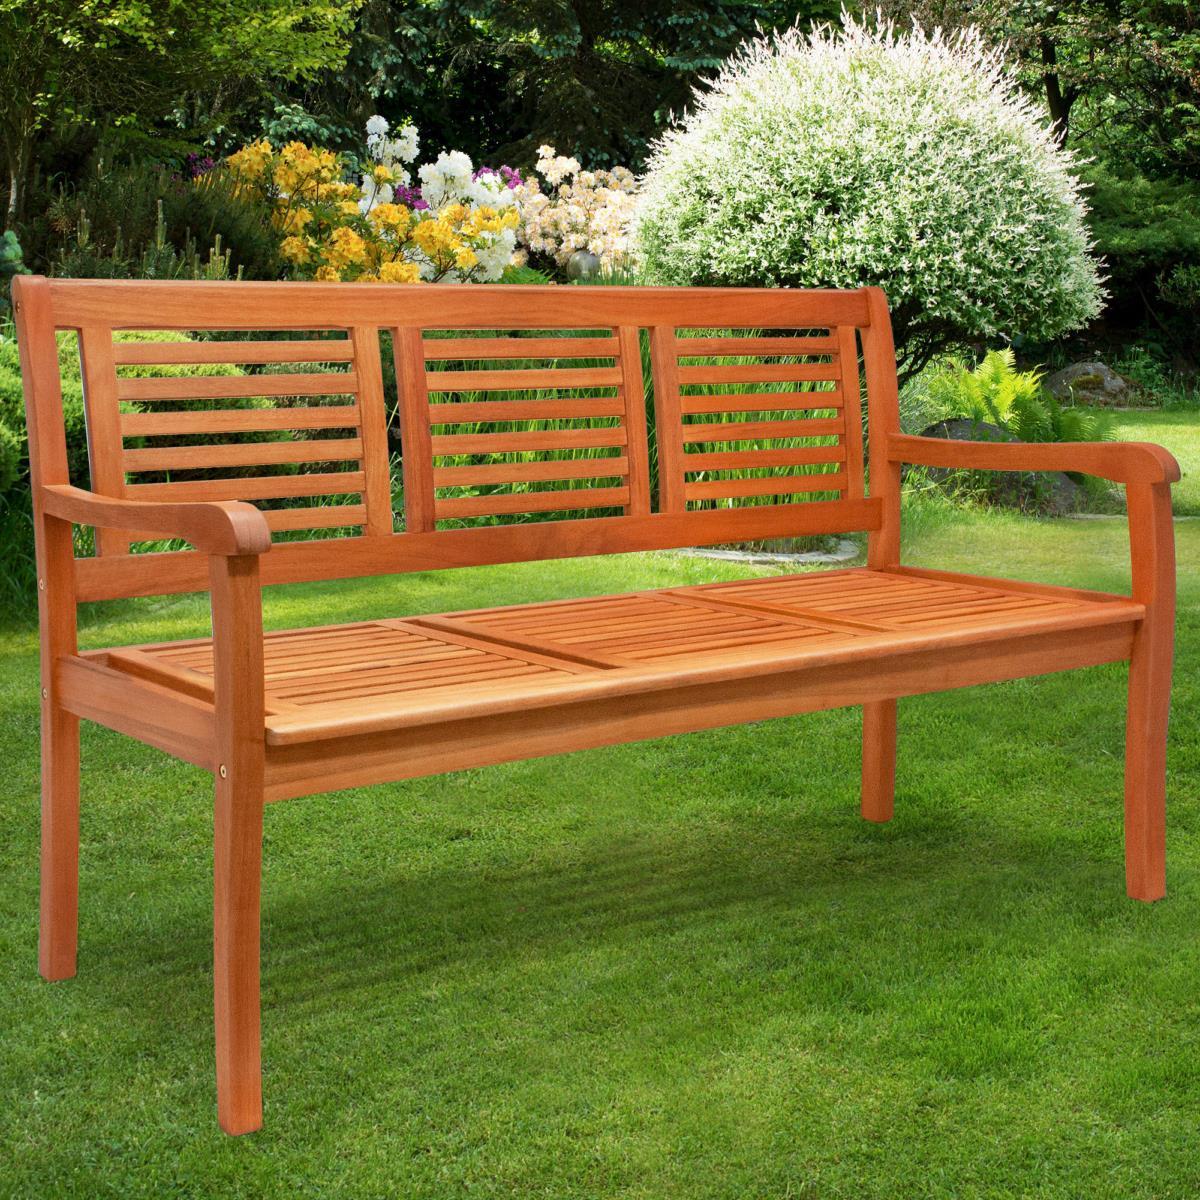 Banc Jardiland Table Table De Jardin Flair Plaisir Meilleures Idees